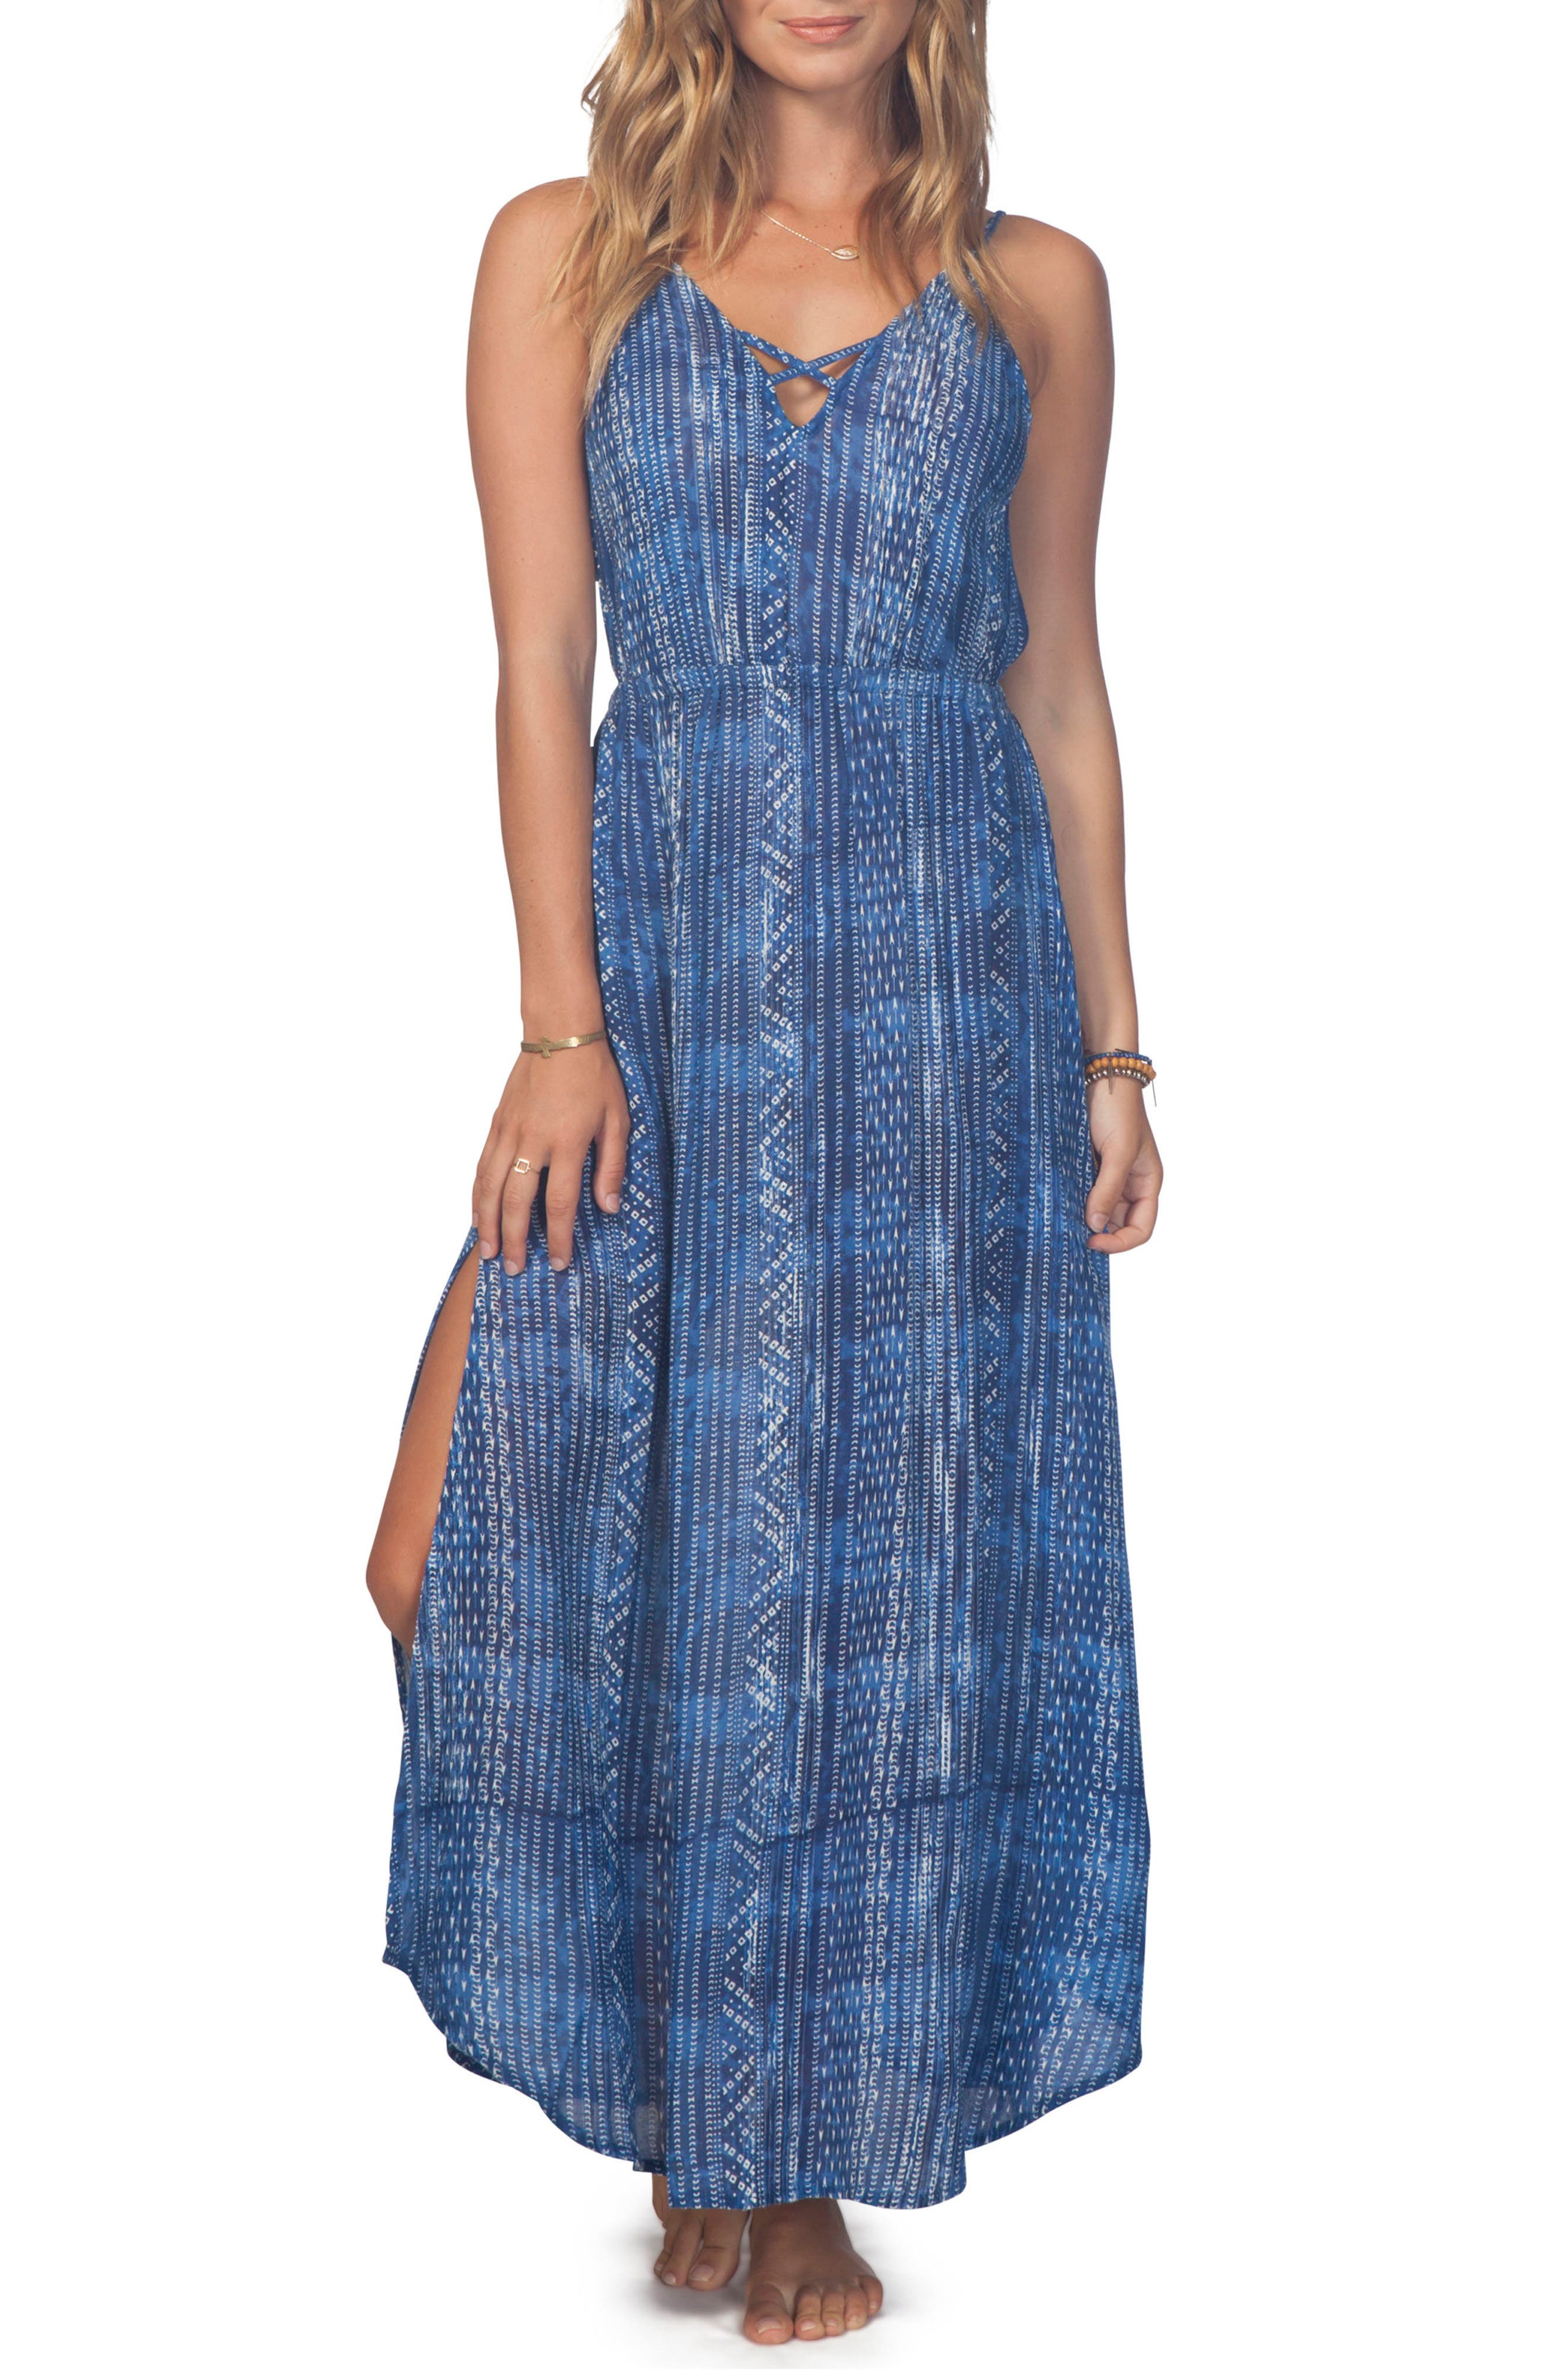 Rip Curl Blue Tides Maxi Dress